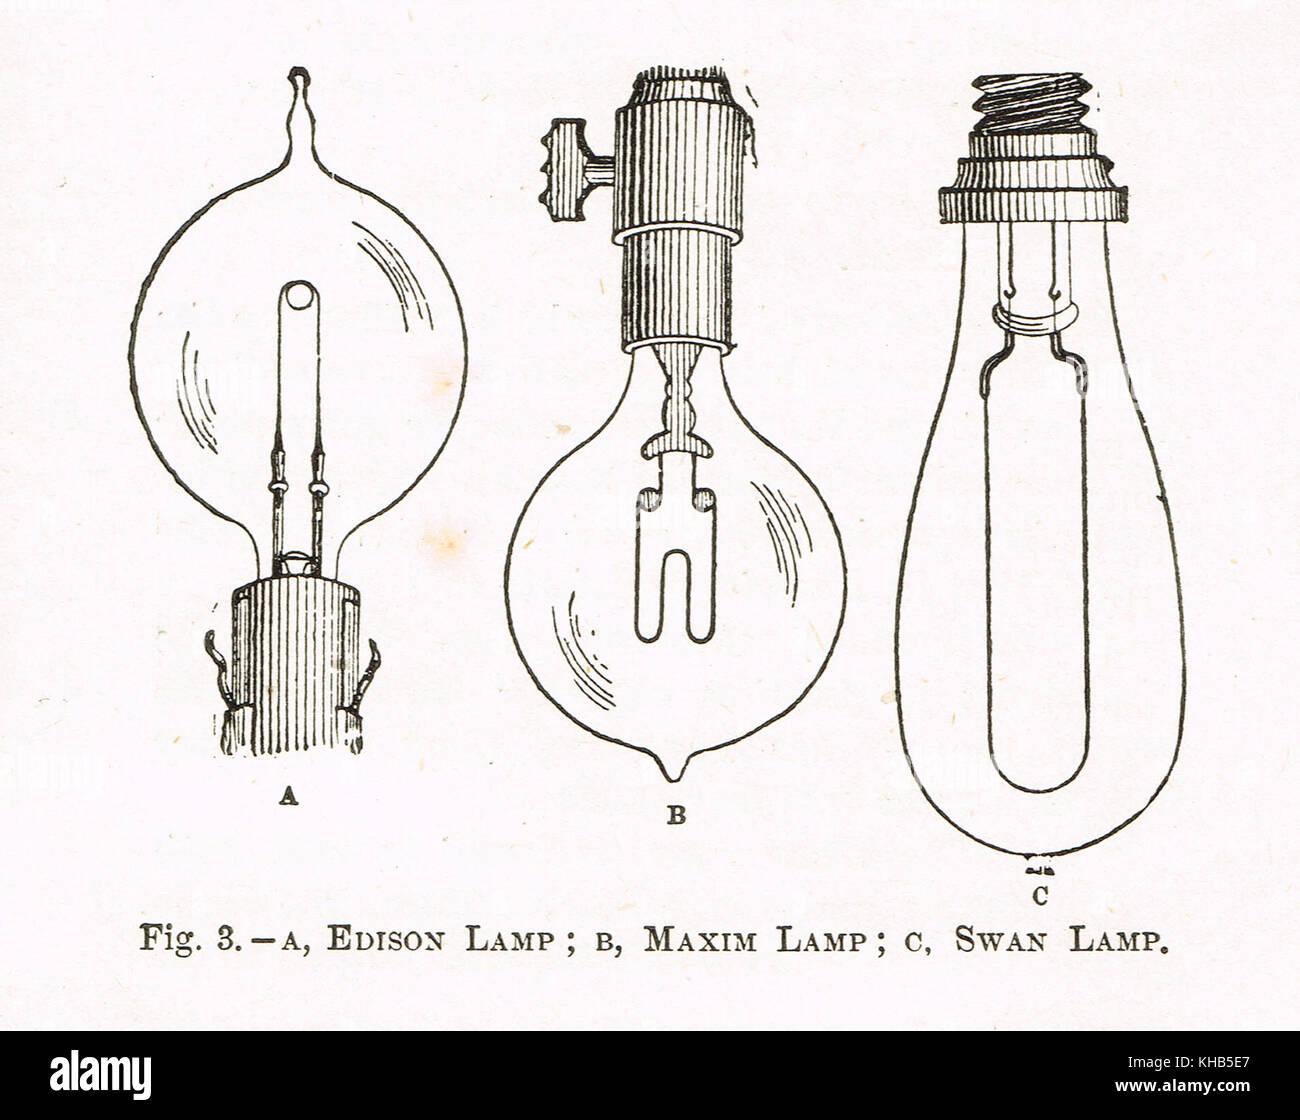 Gluhlampen 19 Jahrhundert Abbildung Edison Lampe Maxim Lampe